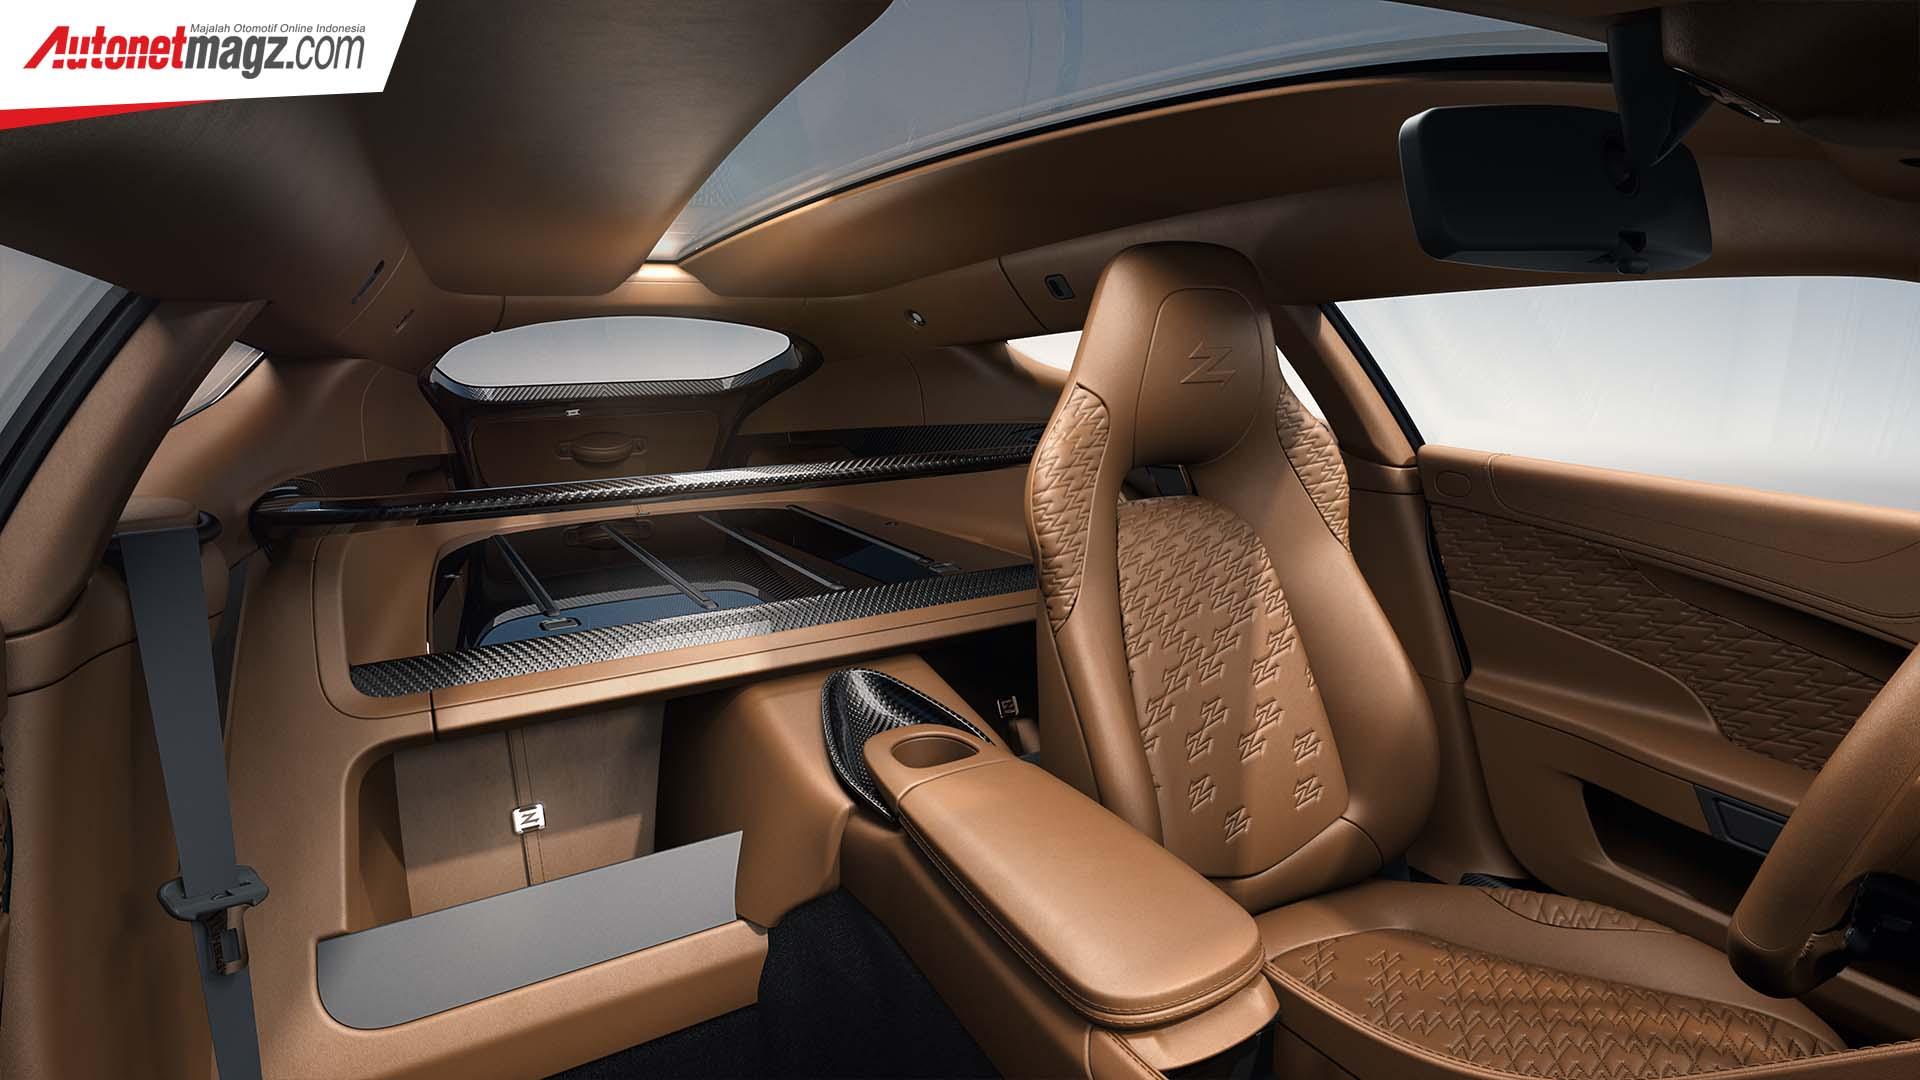 Aston Martin, Aston Martin Vanquish Zagato interior: Aston Martin Vanquish Zagato Shooting Brake, Cuma Ada 99 Unit!